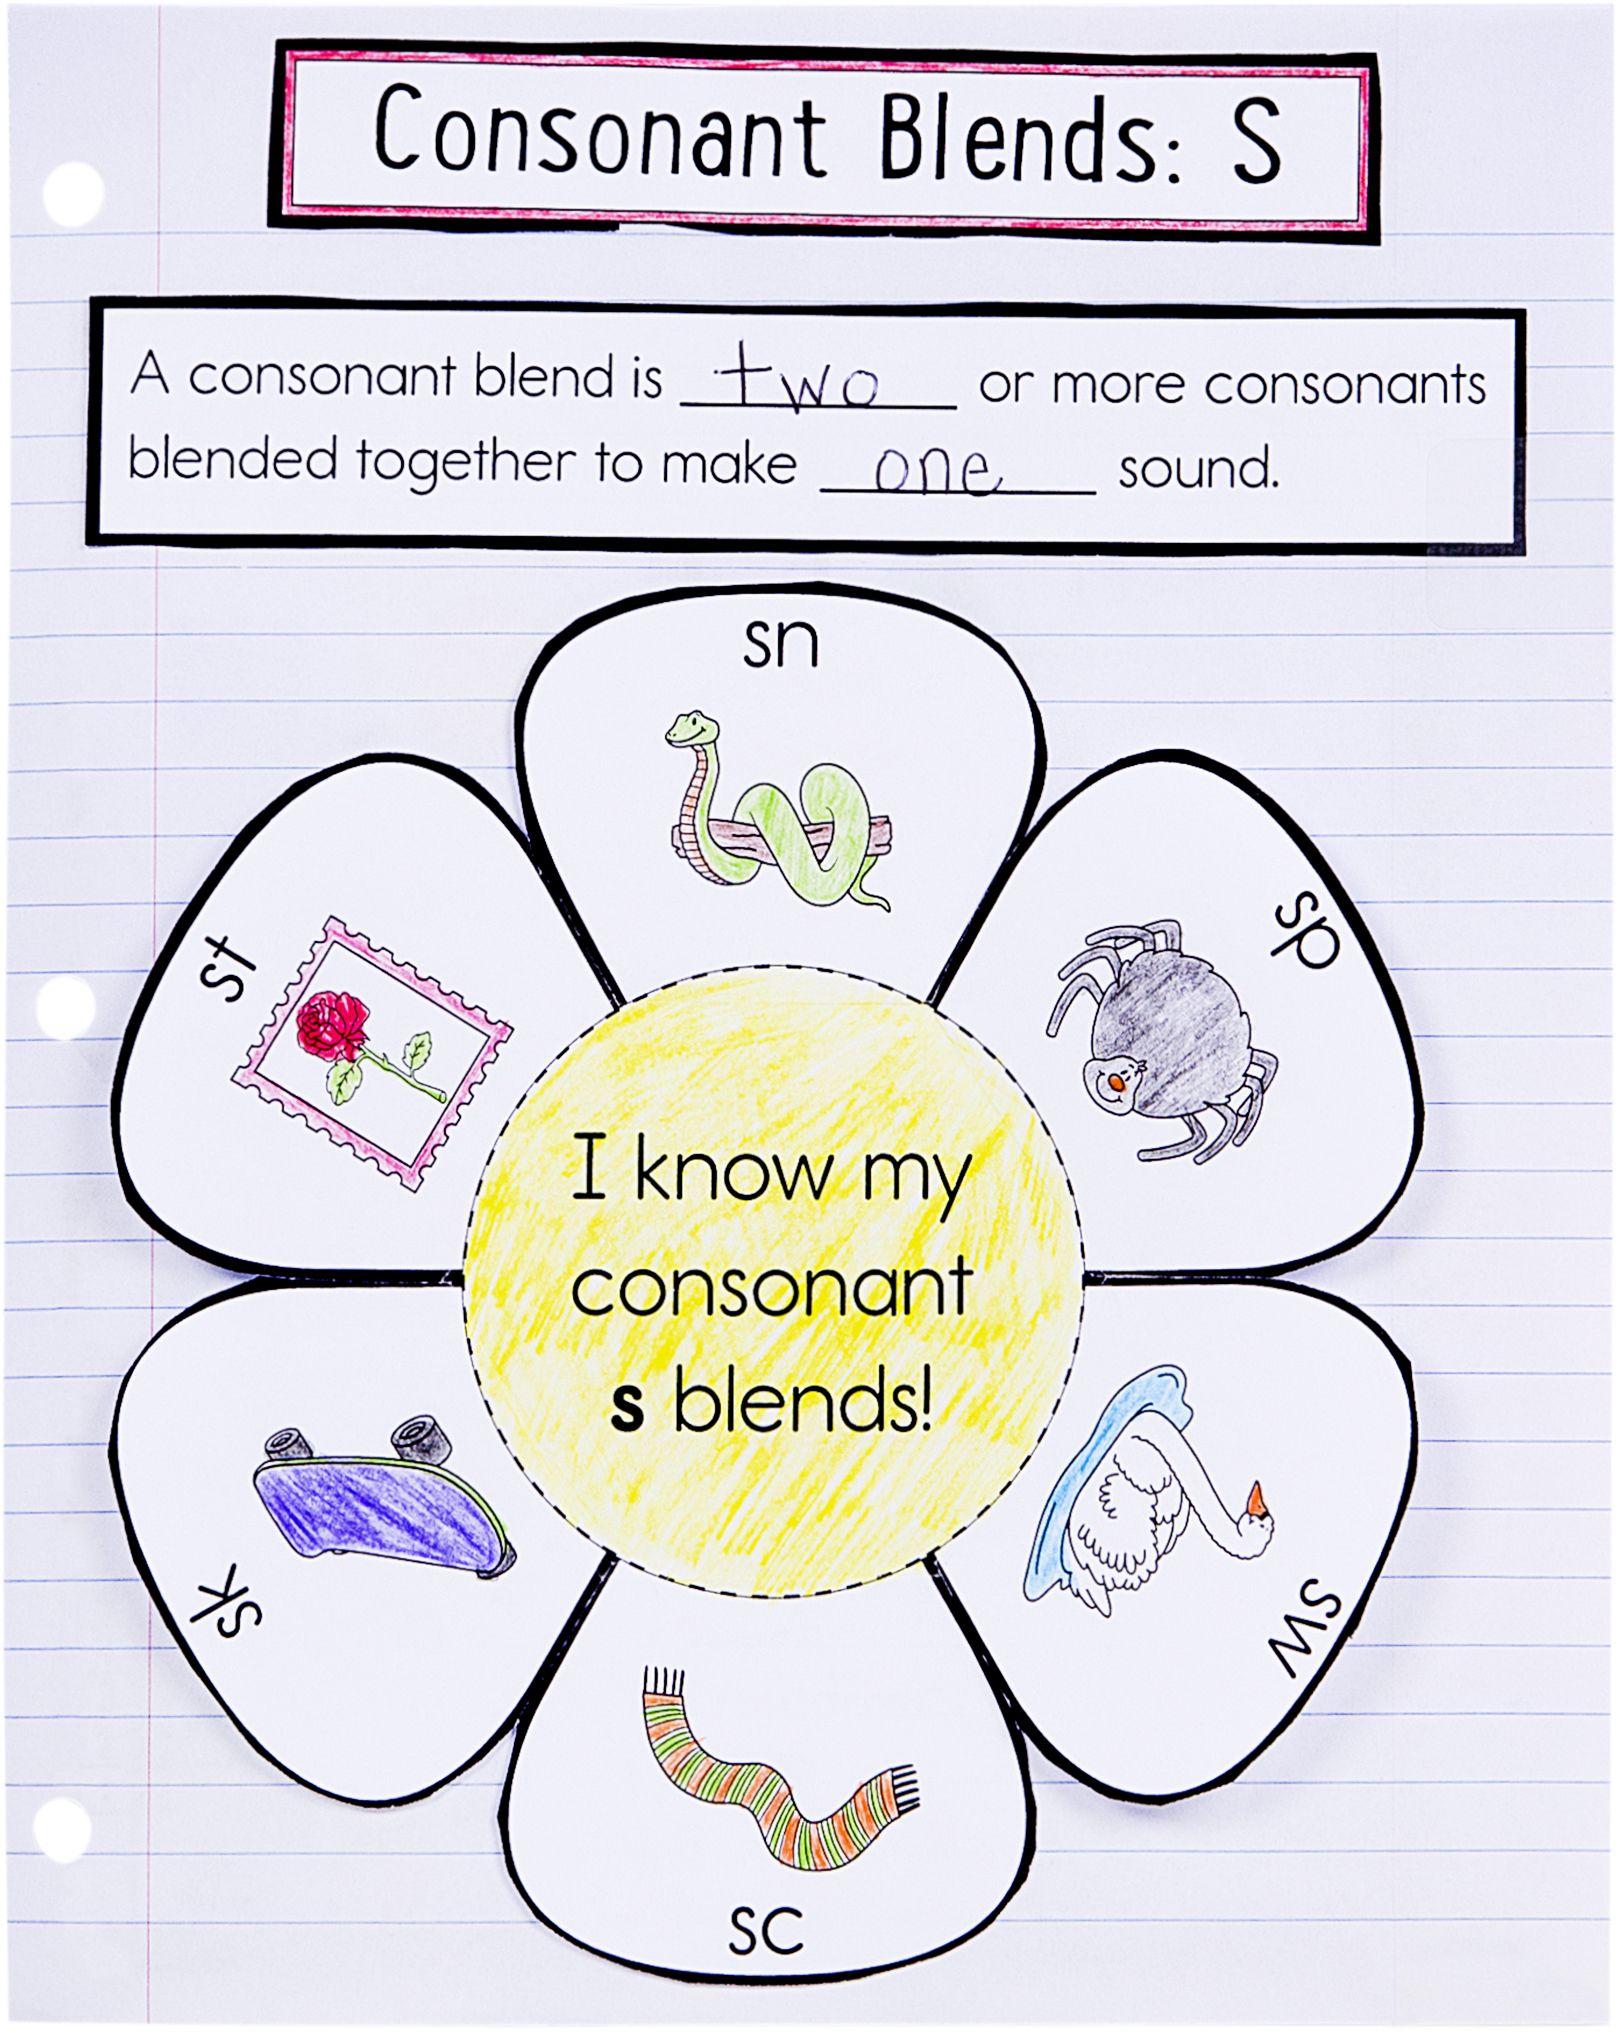 Consonant Blends Worksheets 1st Grade